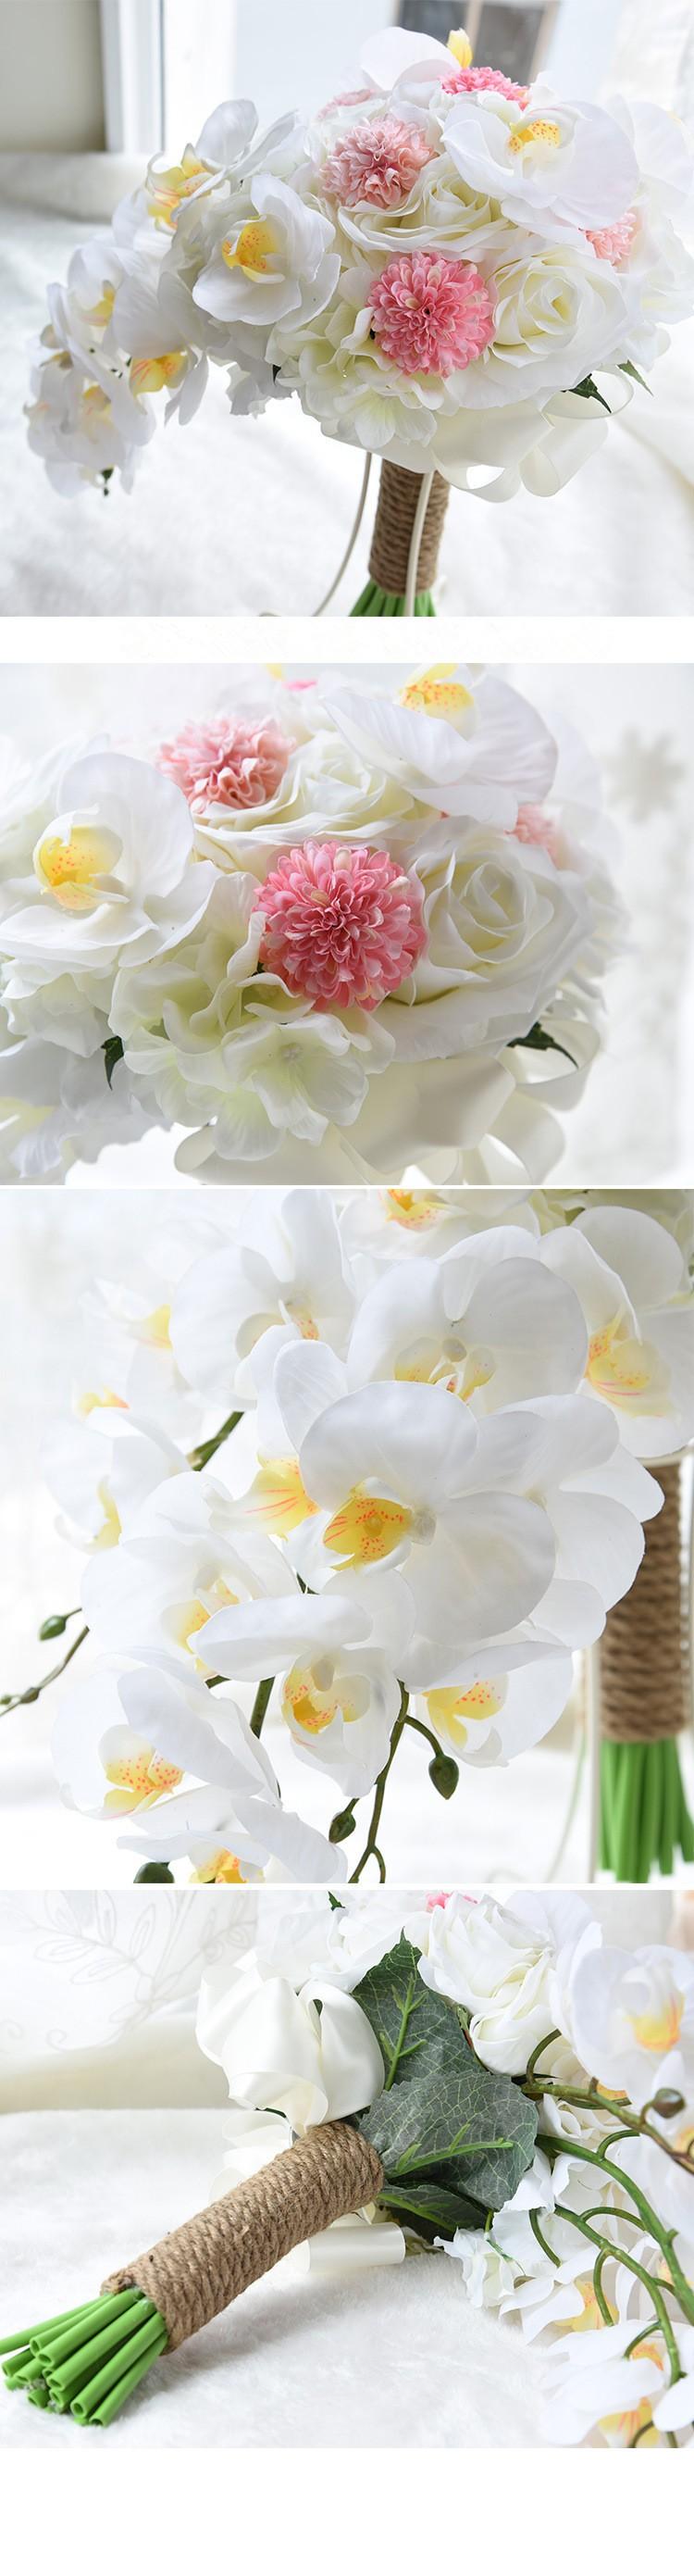 Artificial Waterfall Droplets Wedding Bouquets For Brides White Flowers Bridal Brooch Bouquets Ramo De Novia 2016